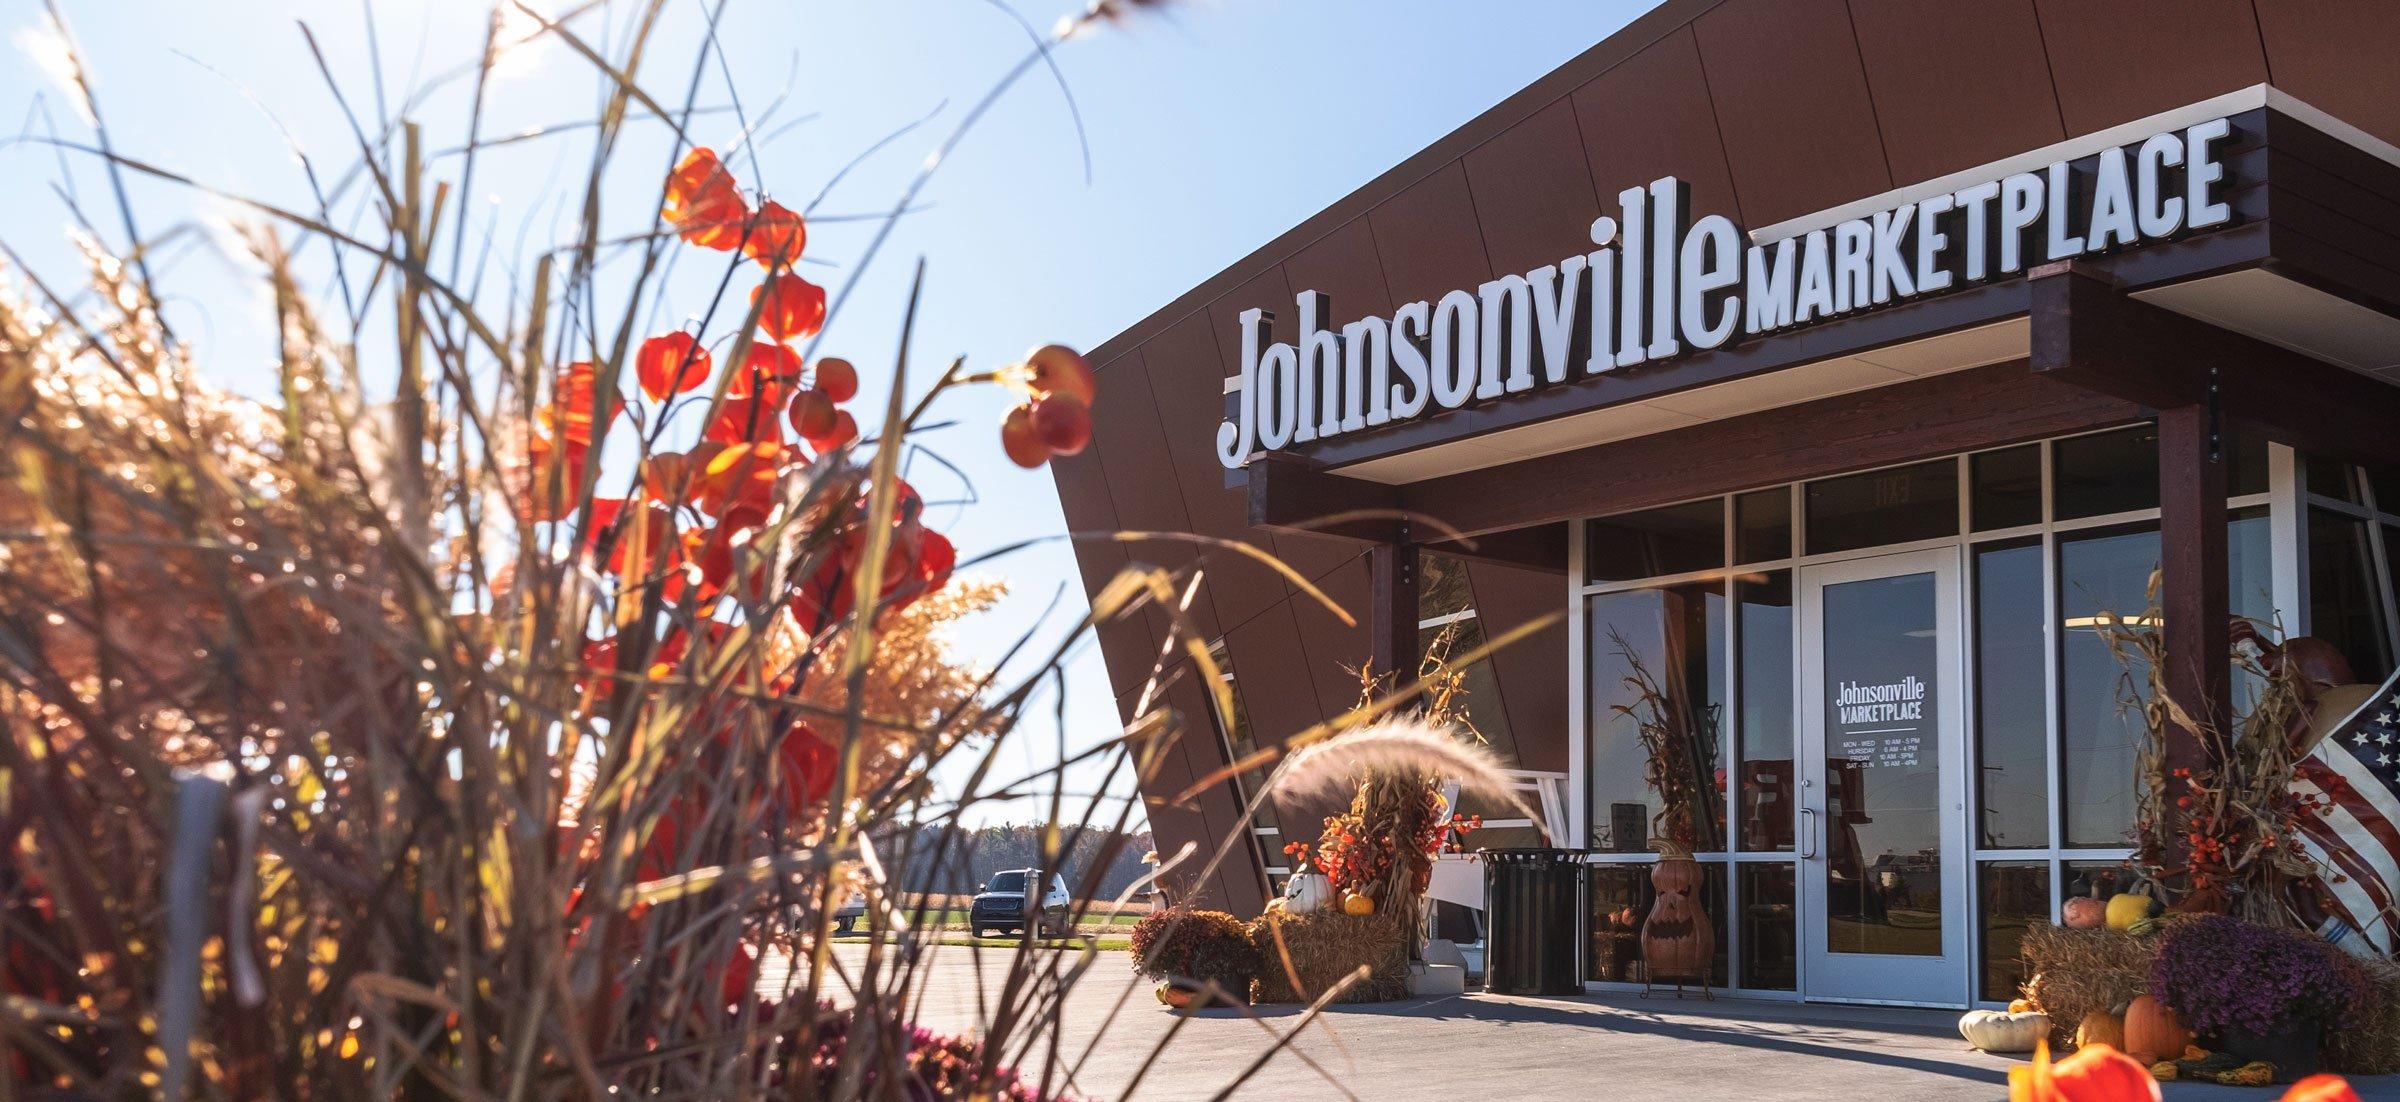 Johnsonville Marketplace Retail Shop Modern Exterior Facade & Interior Design Green Build by C.D. Smith Construction Manager